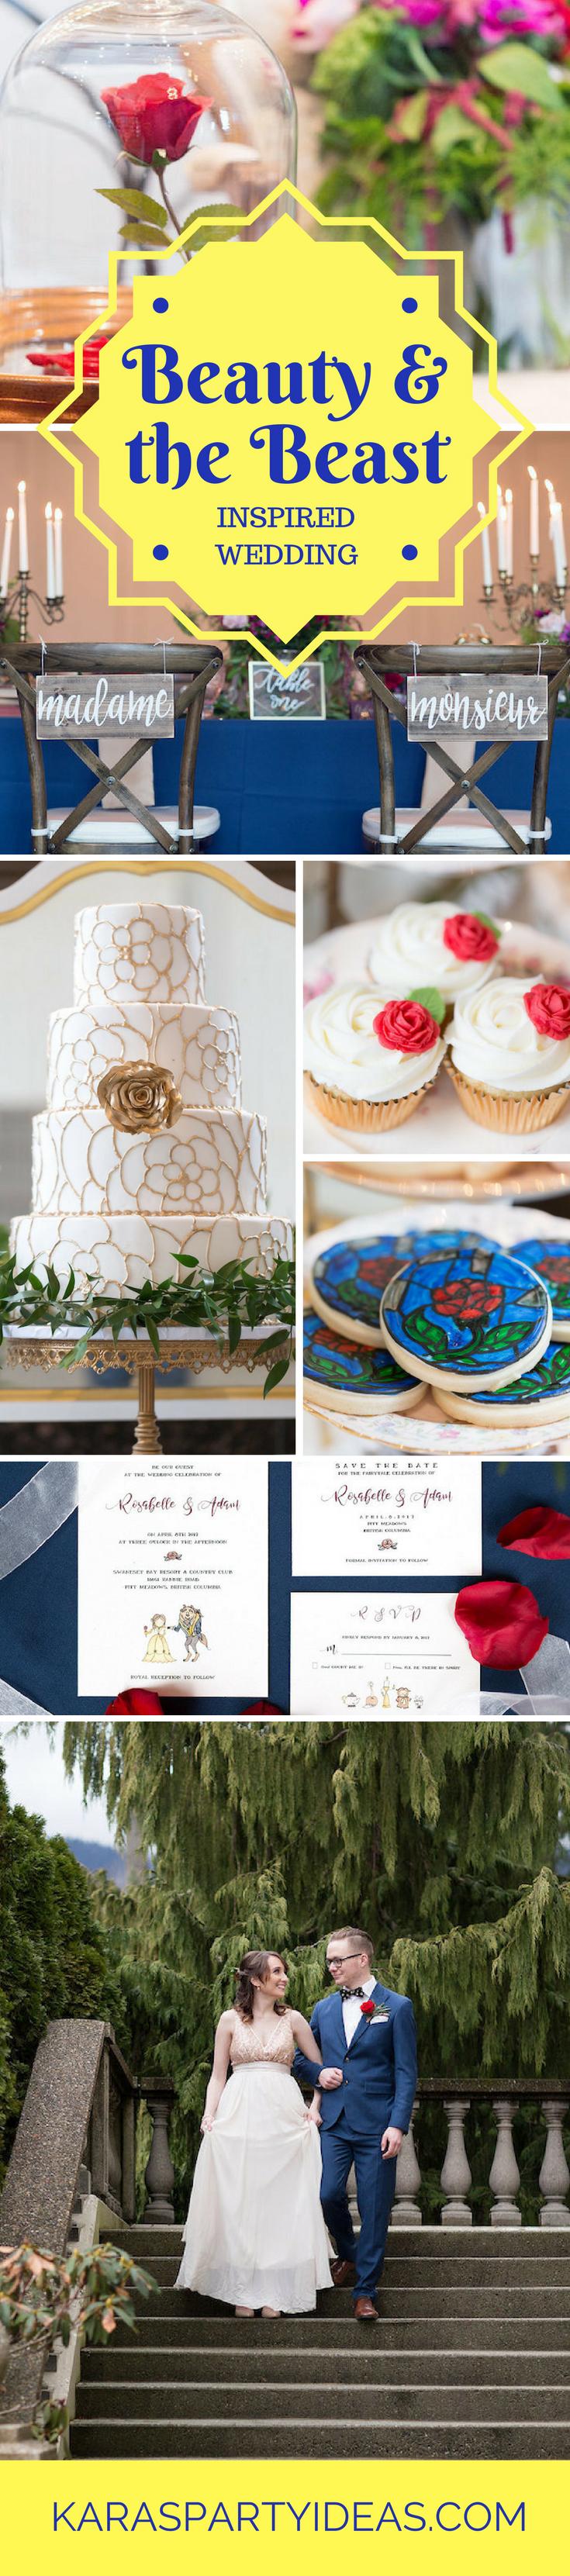 Beauty and the Beast Inspired Wedding via Kara's Party Ideas